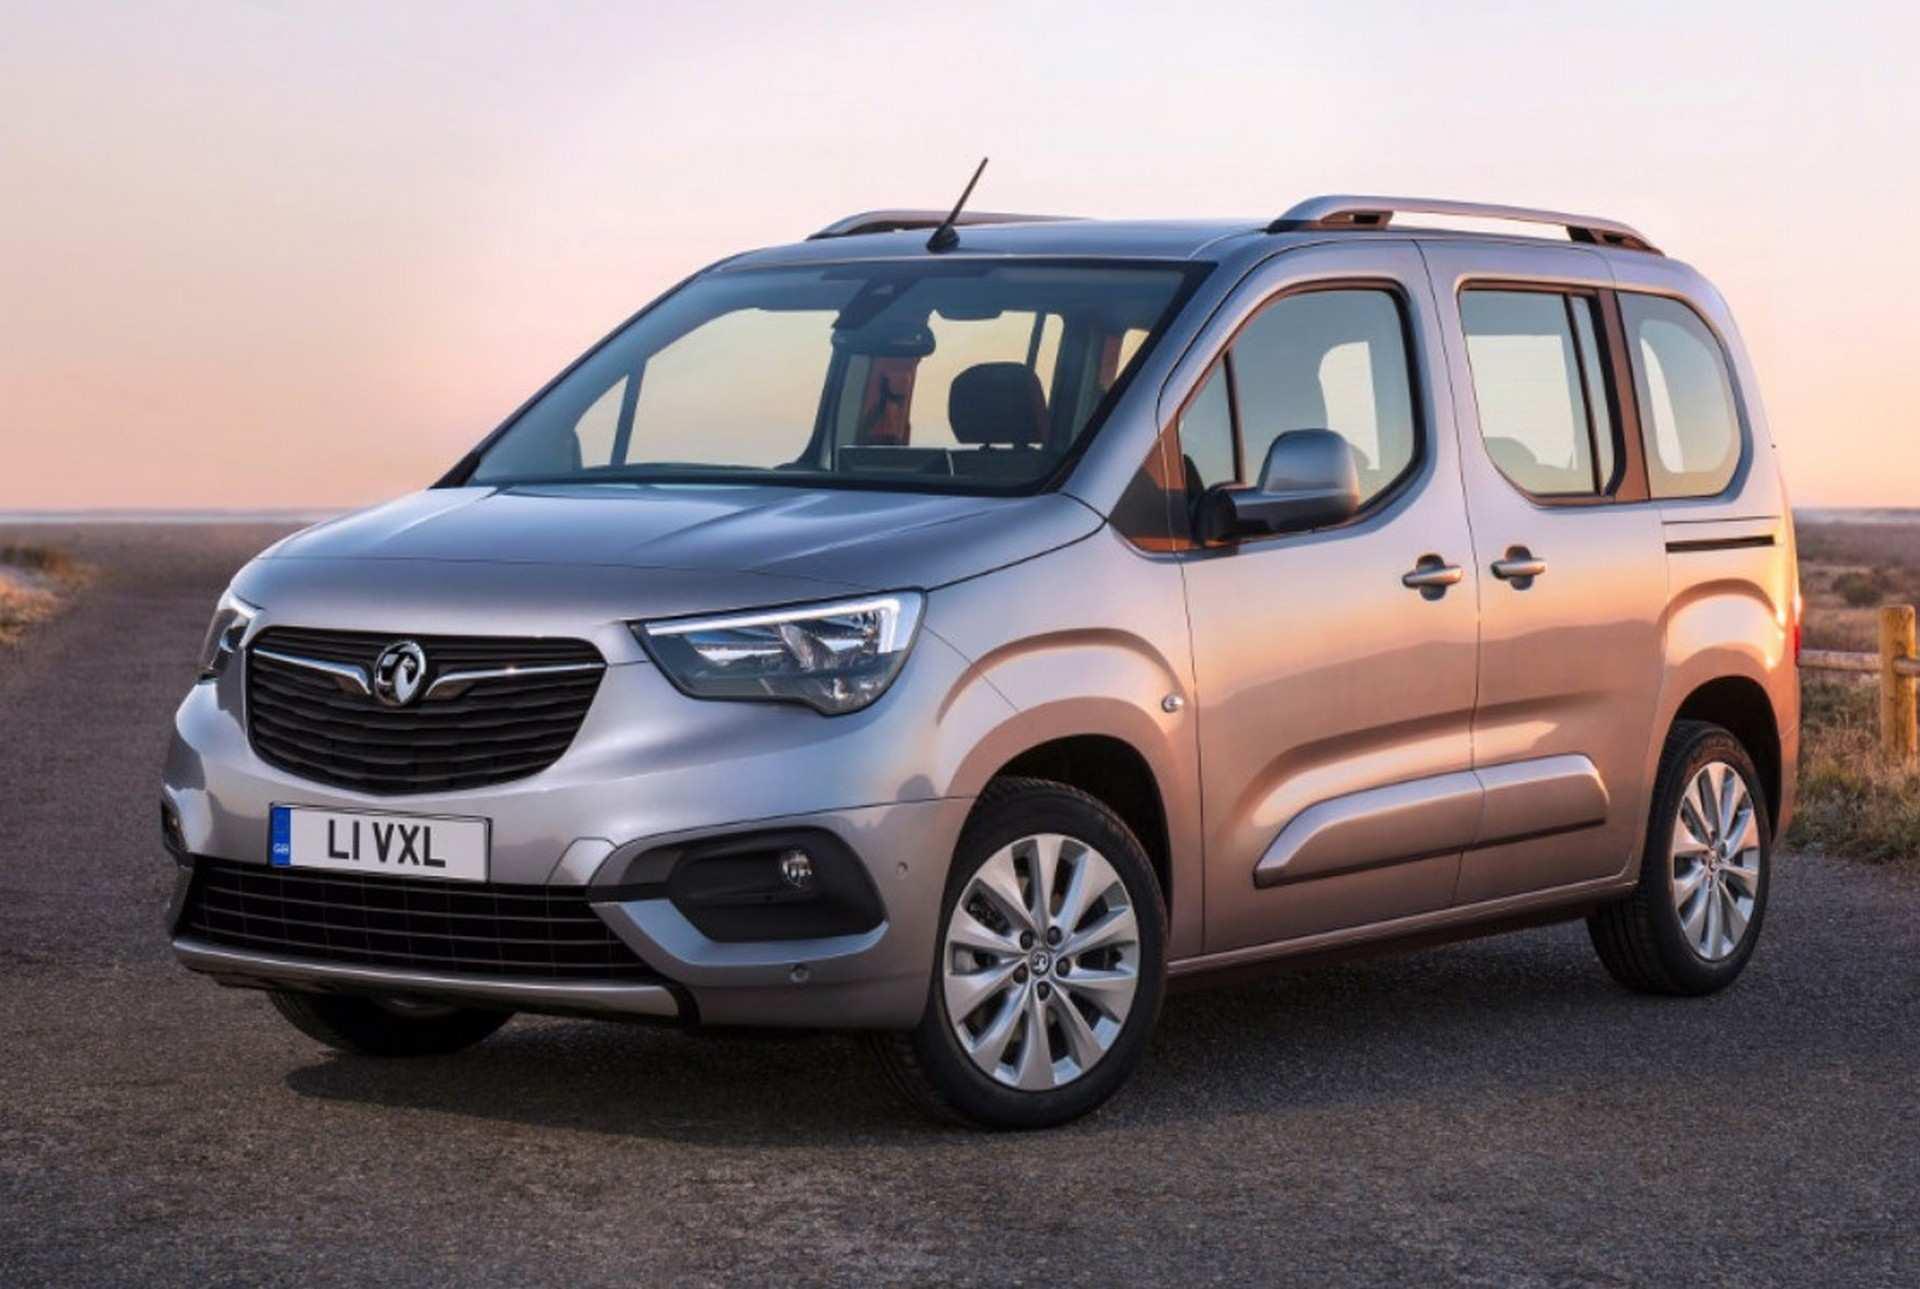 76 Concept of Opel Colorado 2019 New Concept for Opel Colorado 2019